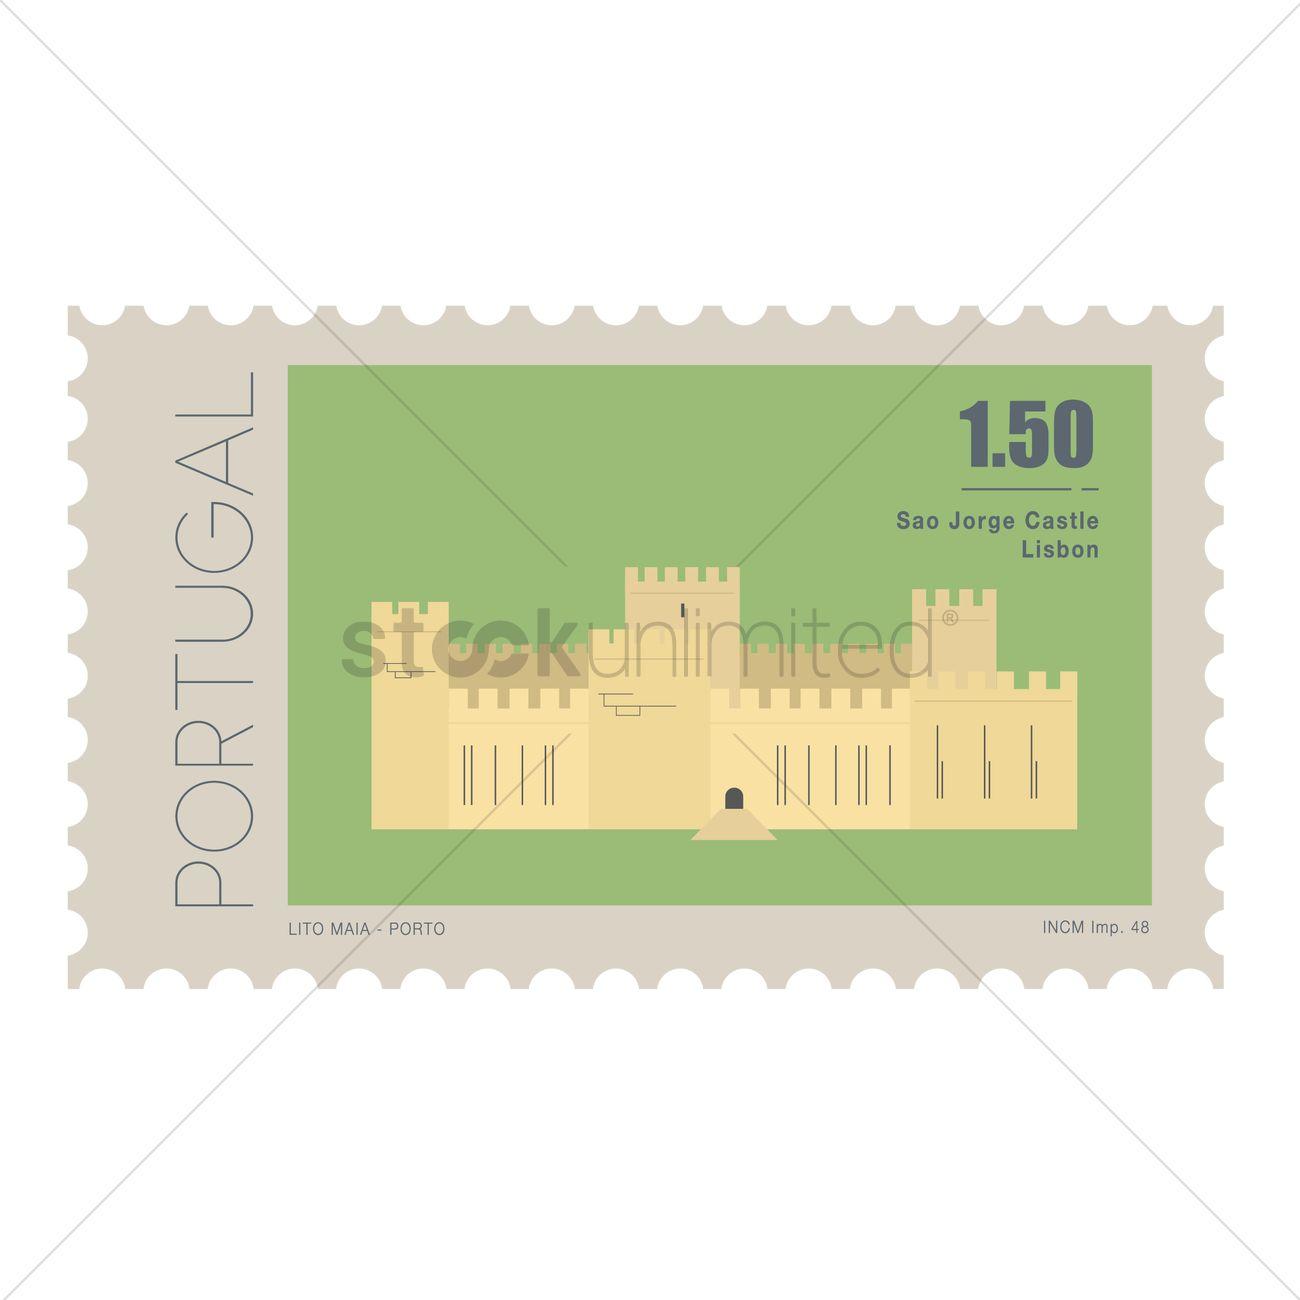 Sao jorge castle postage stamp Vector Image.